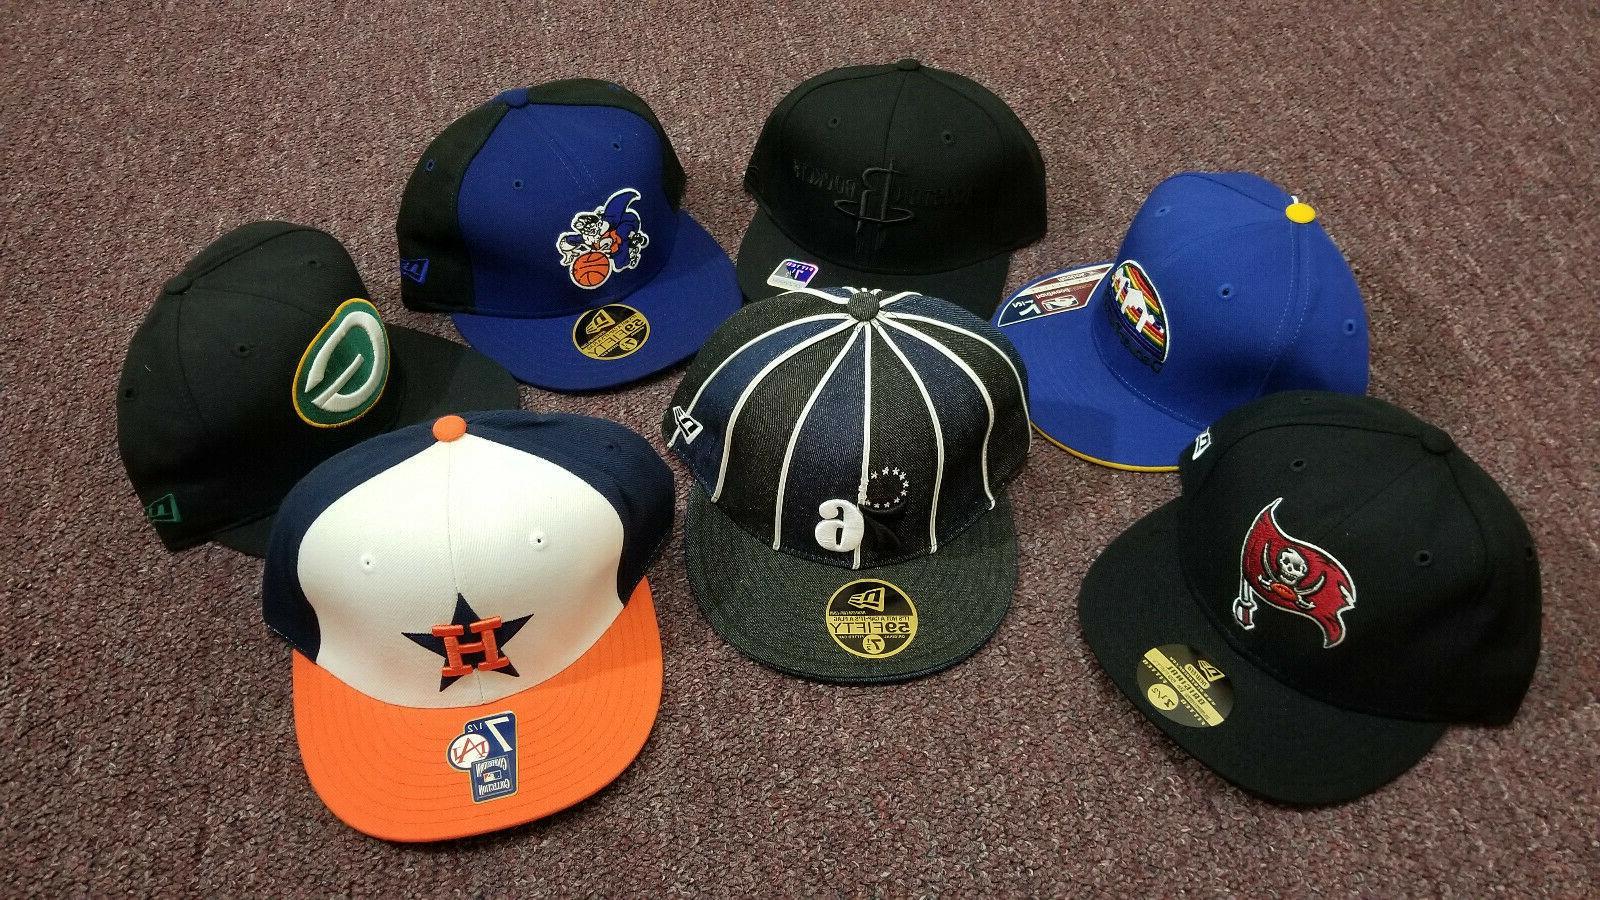 NBA NFL MLB Baseball Caps, Size Reebok New Original